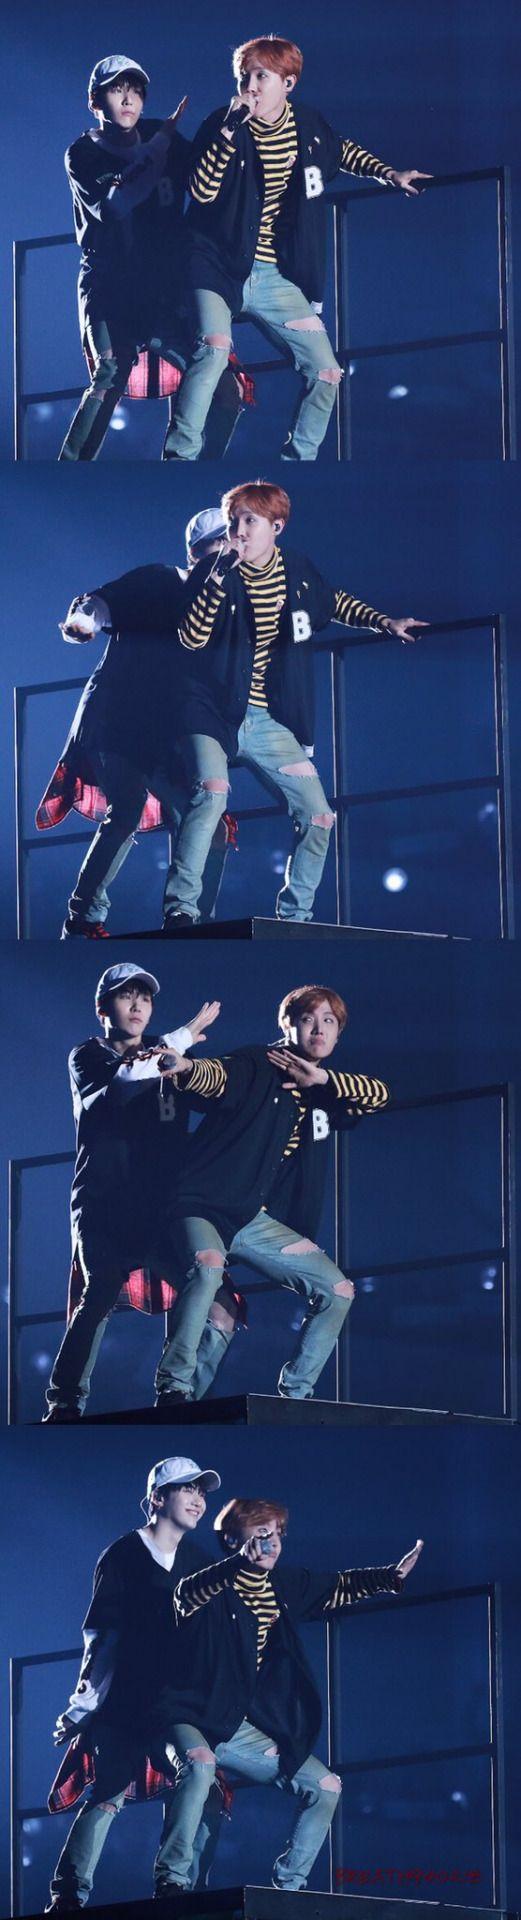 """ 161112 BTS 3rd Muster @ Gocheok Sky Dome  © Breath | Do not edit.  """